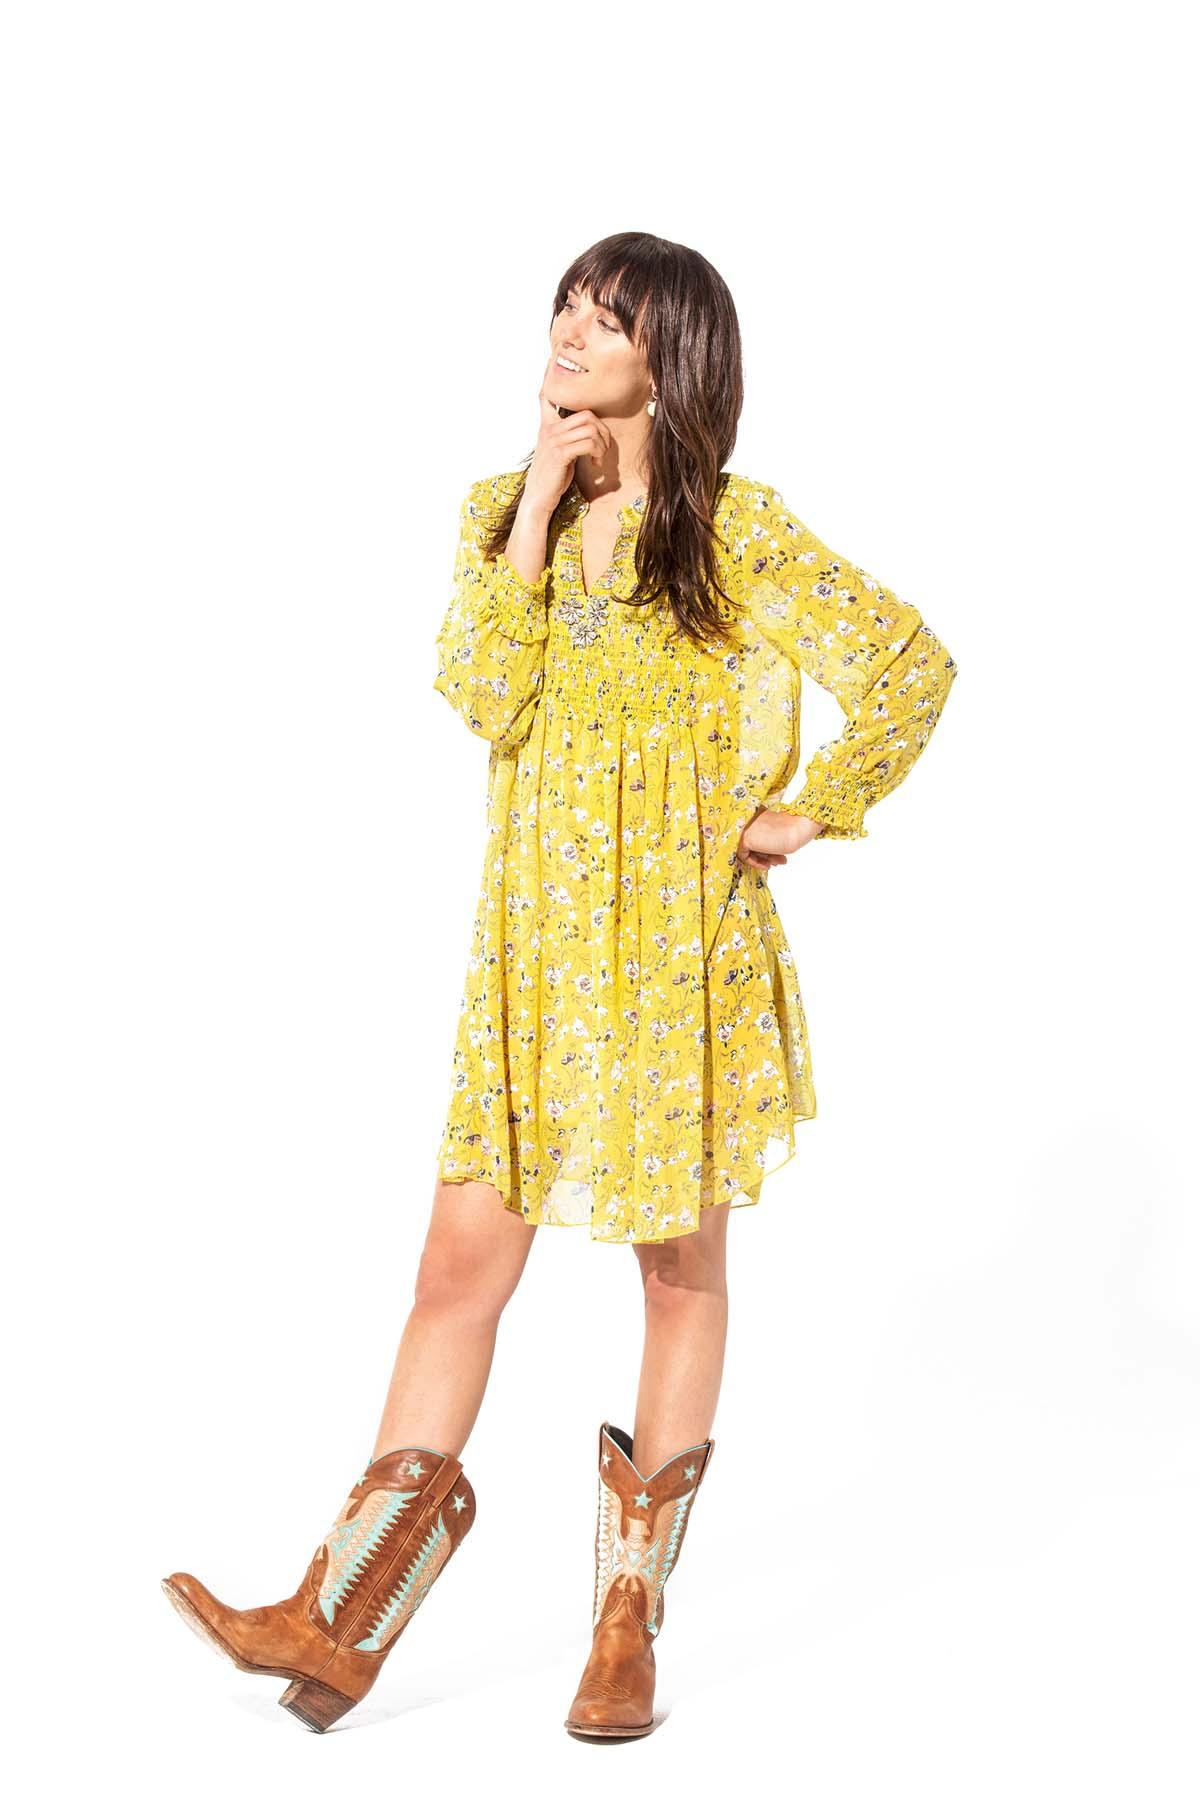 Teria Yabar - Vestido suelto y mini